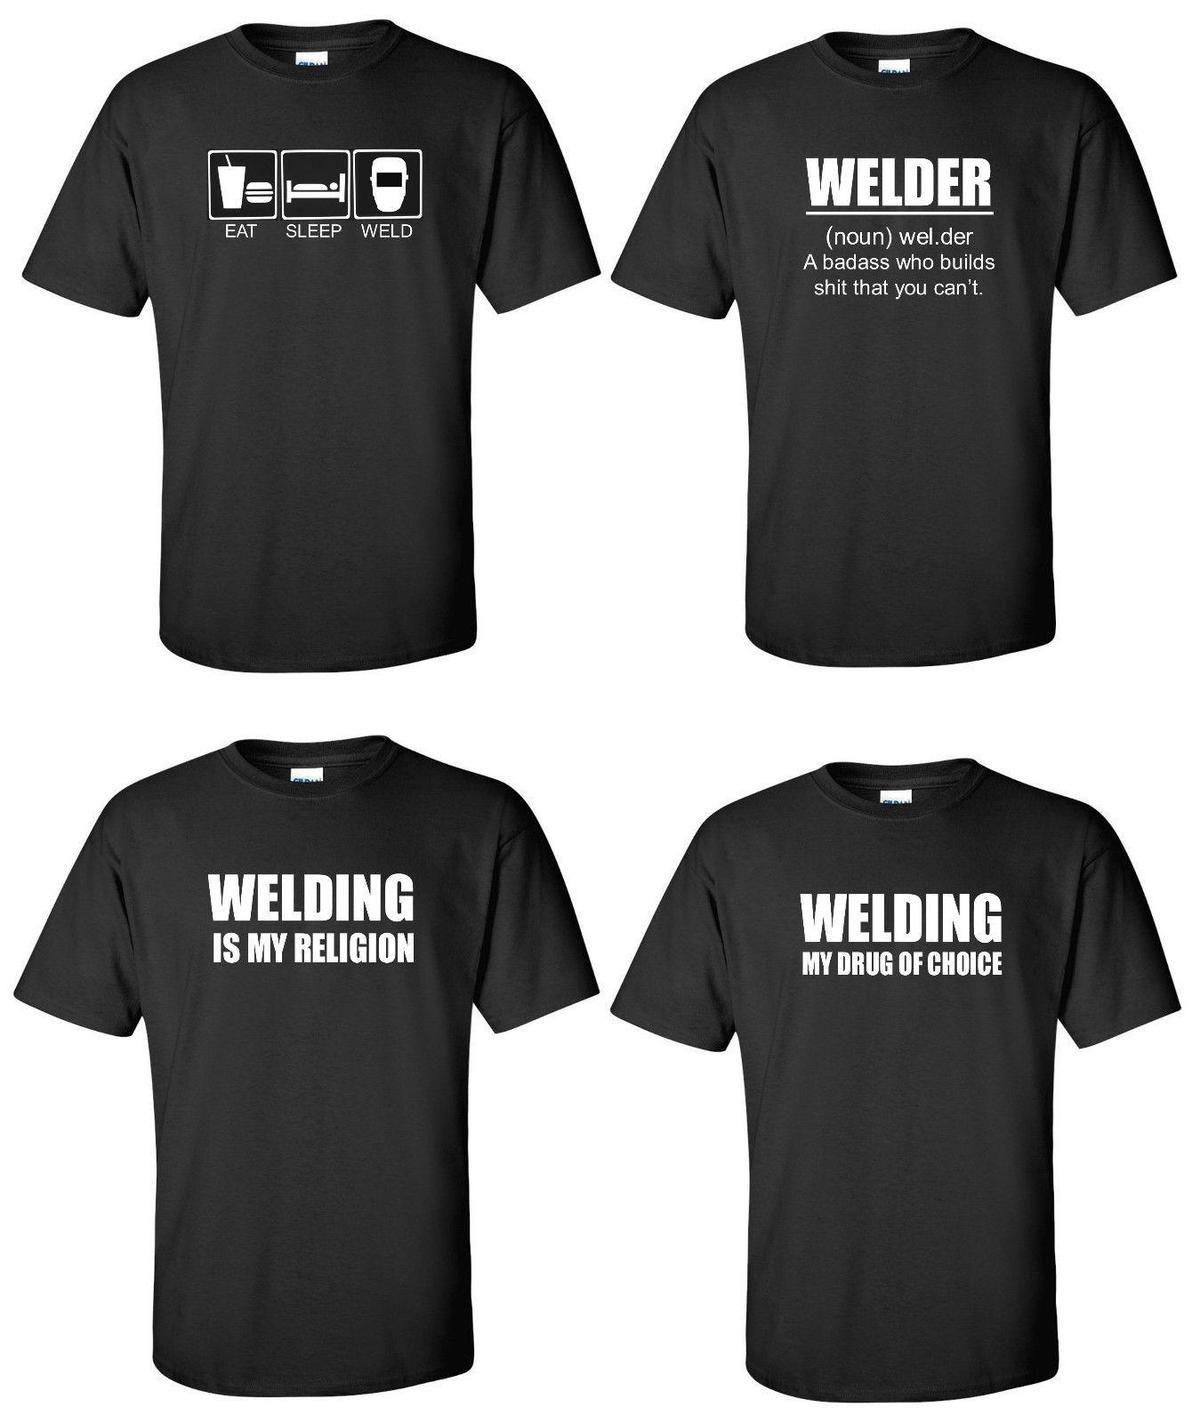 Welder T Shirt Eat Sleep Weld Welding Defintion Your Choice Funny